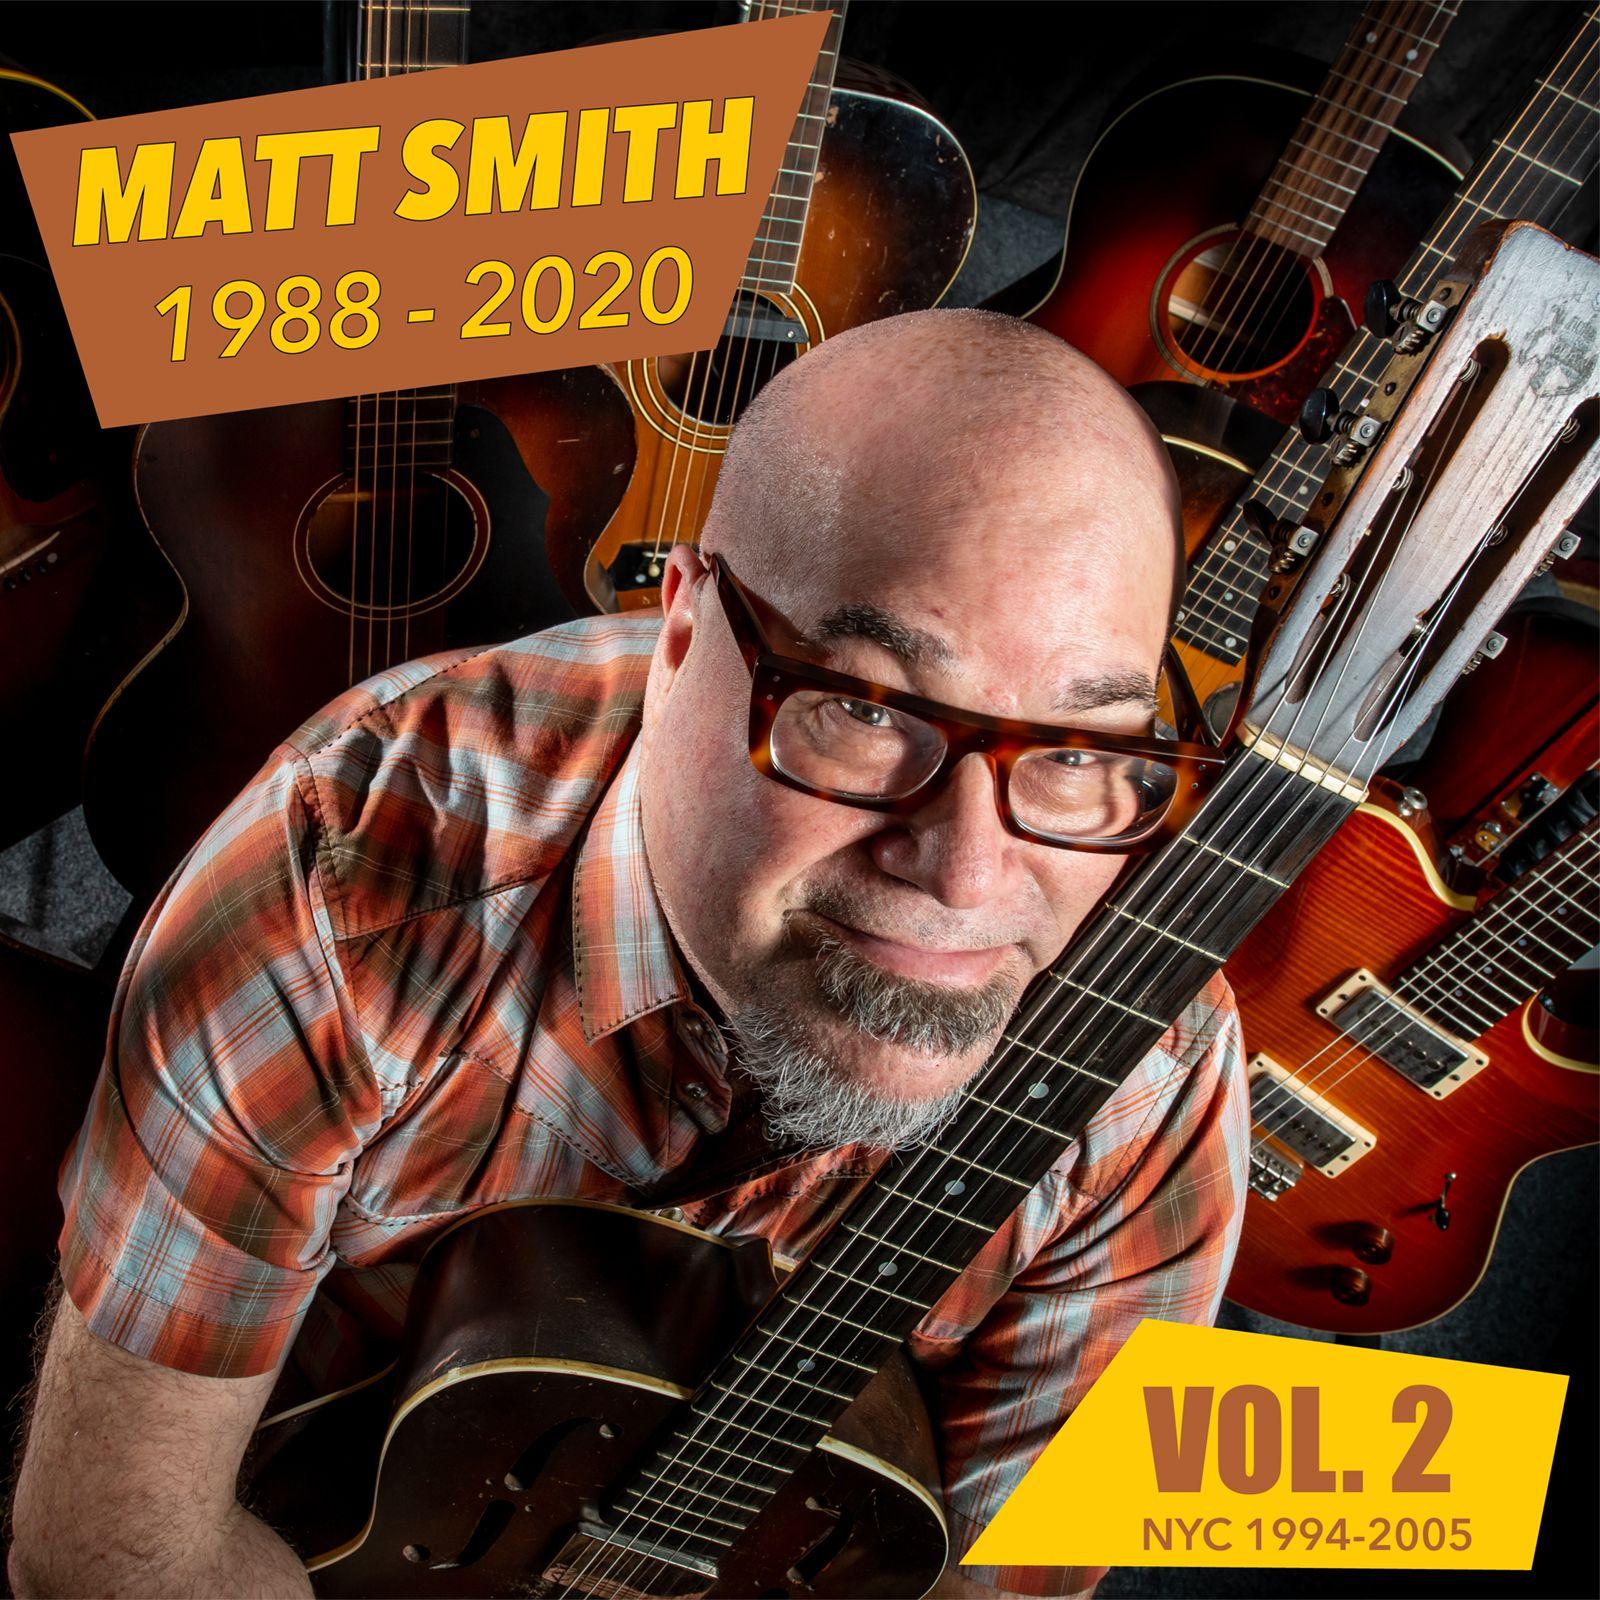 Matt Smith 1988-2020 Vol.2 -  NYC 1994-2005 Cover art